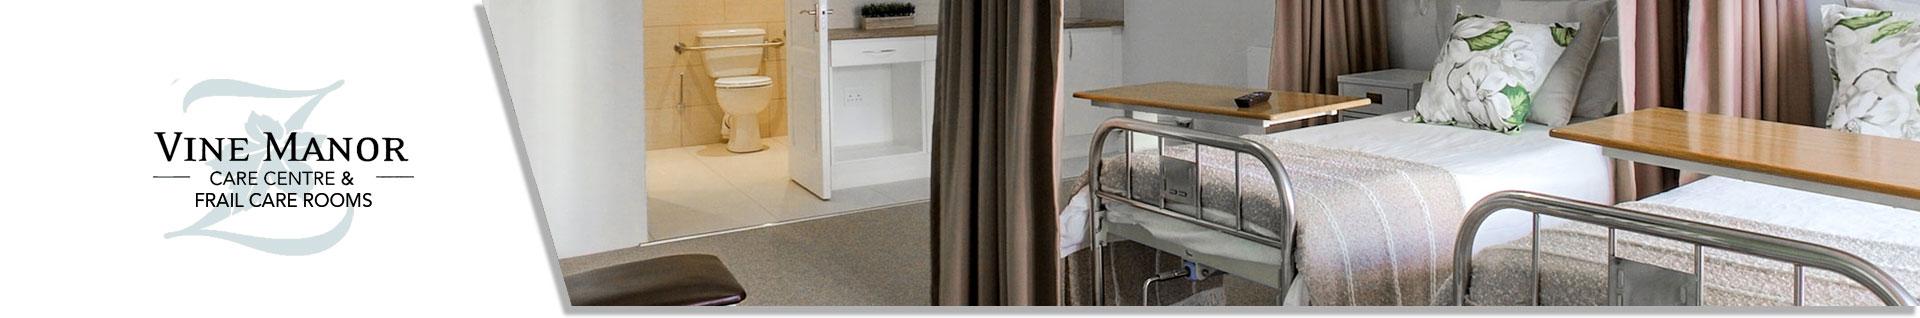 zevenwacht-frail-care-homepage-slide-in-1